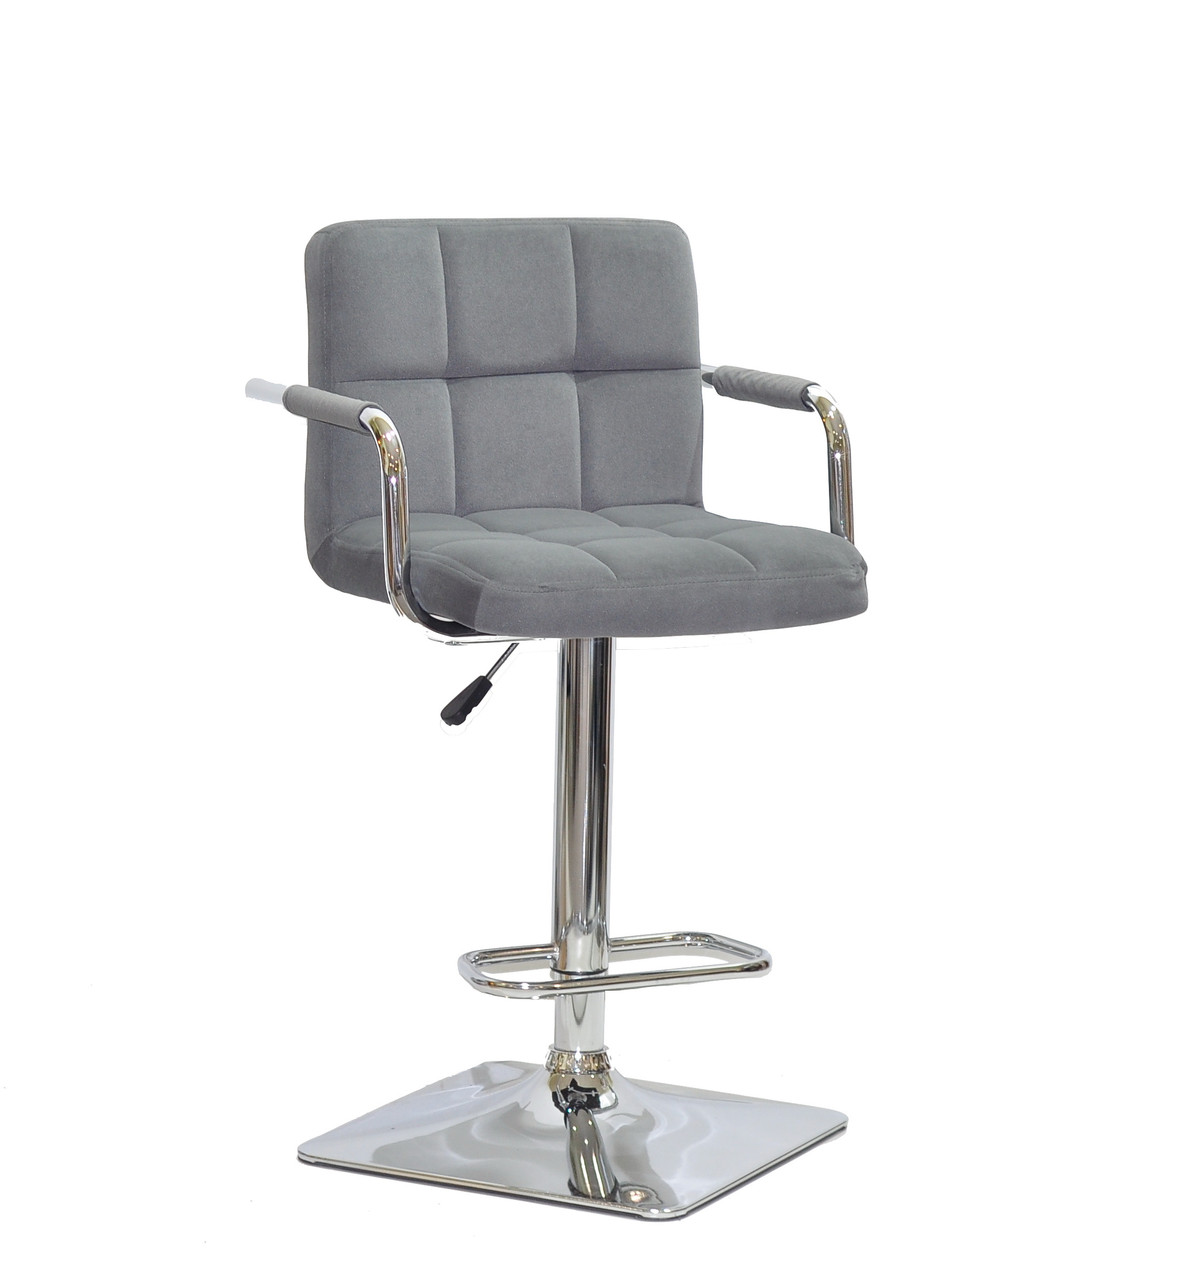 Барный стул Арно серый бархат с подлокотниками на квадратной хром базе ARNO BAR 4CH - BASE